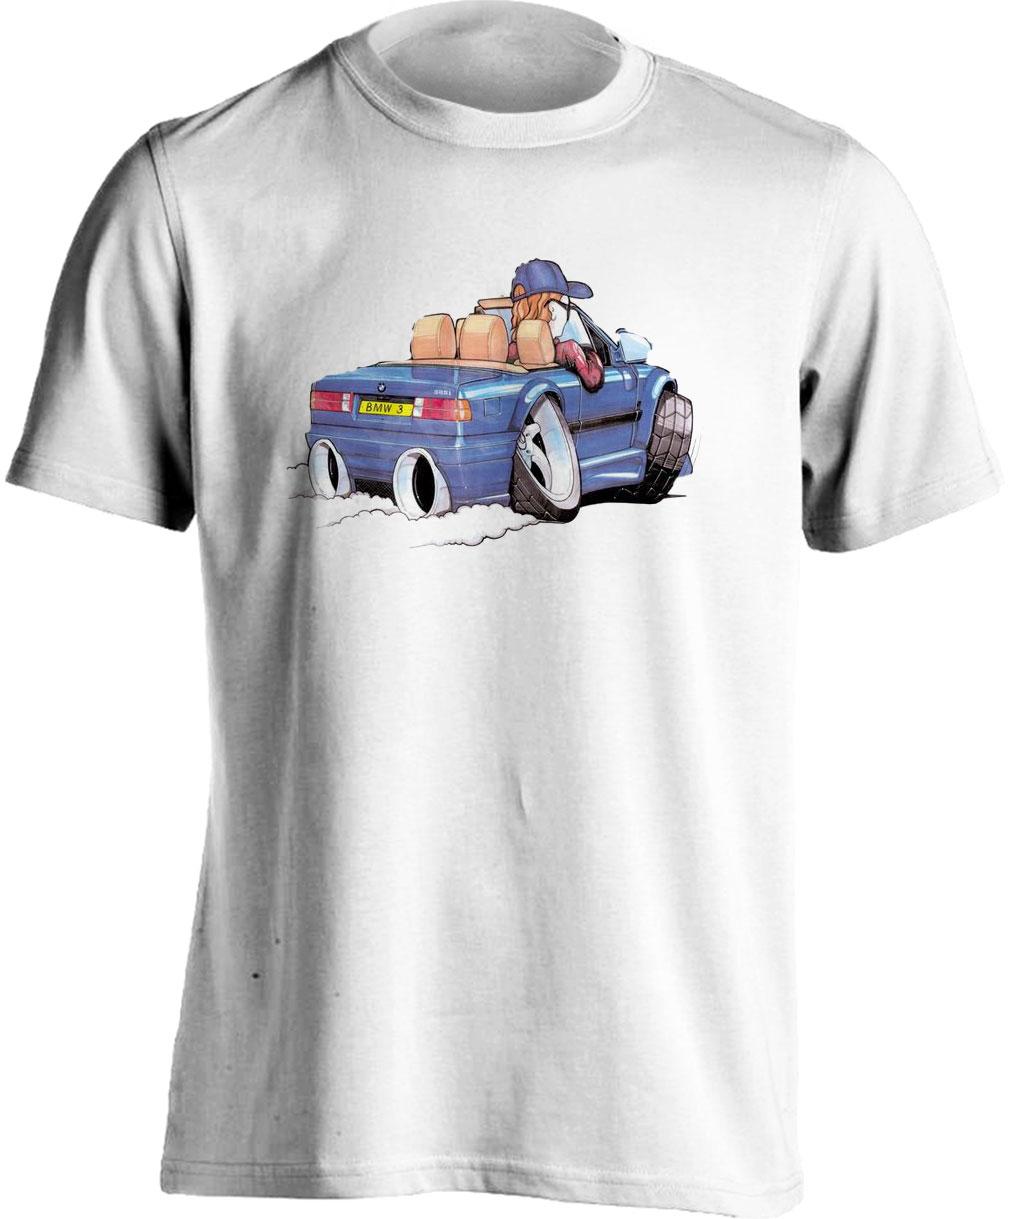 Koolart BMW 325I Blue- 1514 -Adults Unisex T Shirt